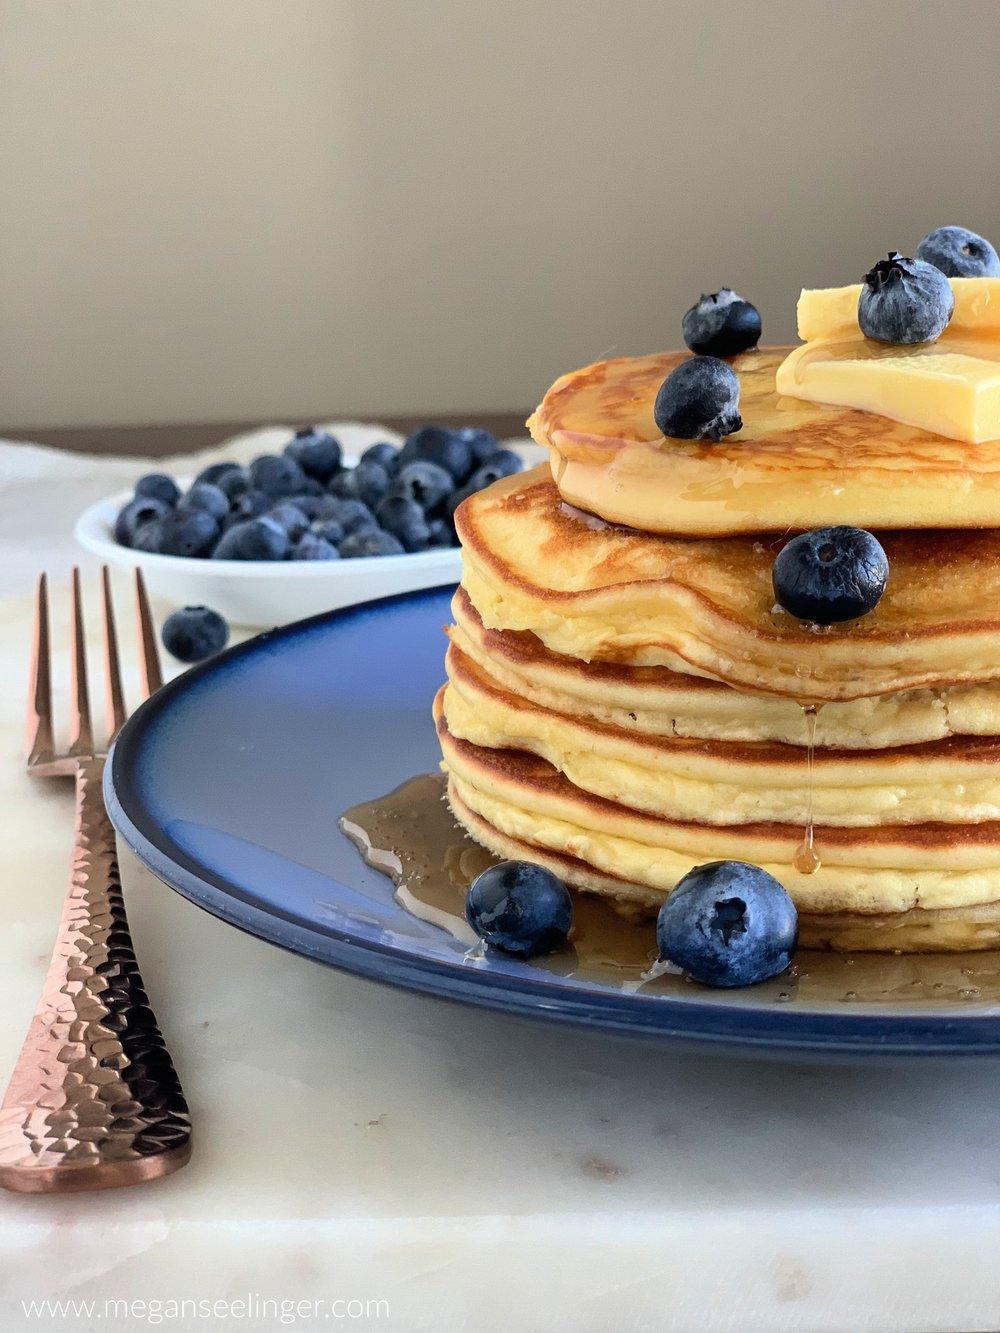 The Best Keto Pancakes Recipe With Coconut Flour Megan Seelinger Coaching